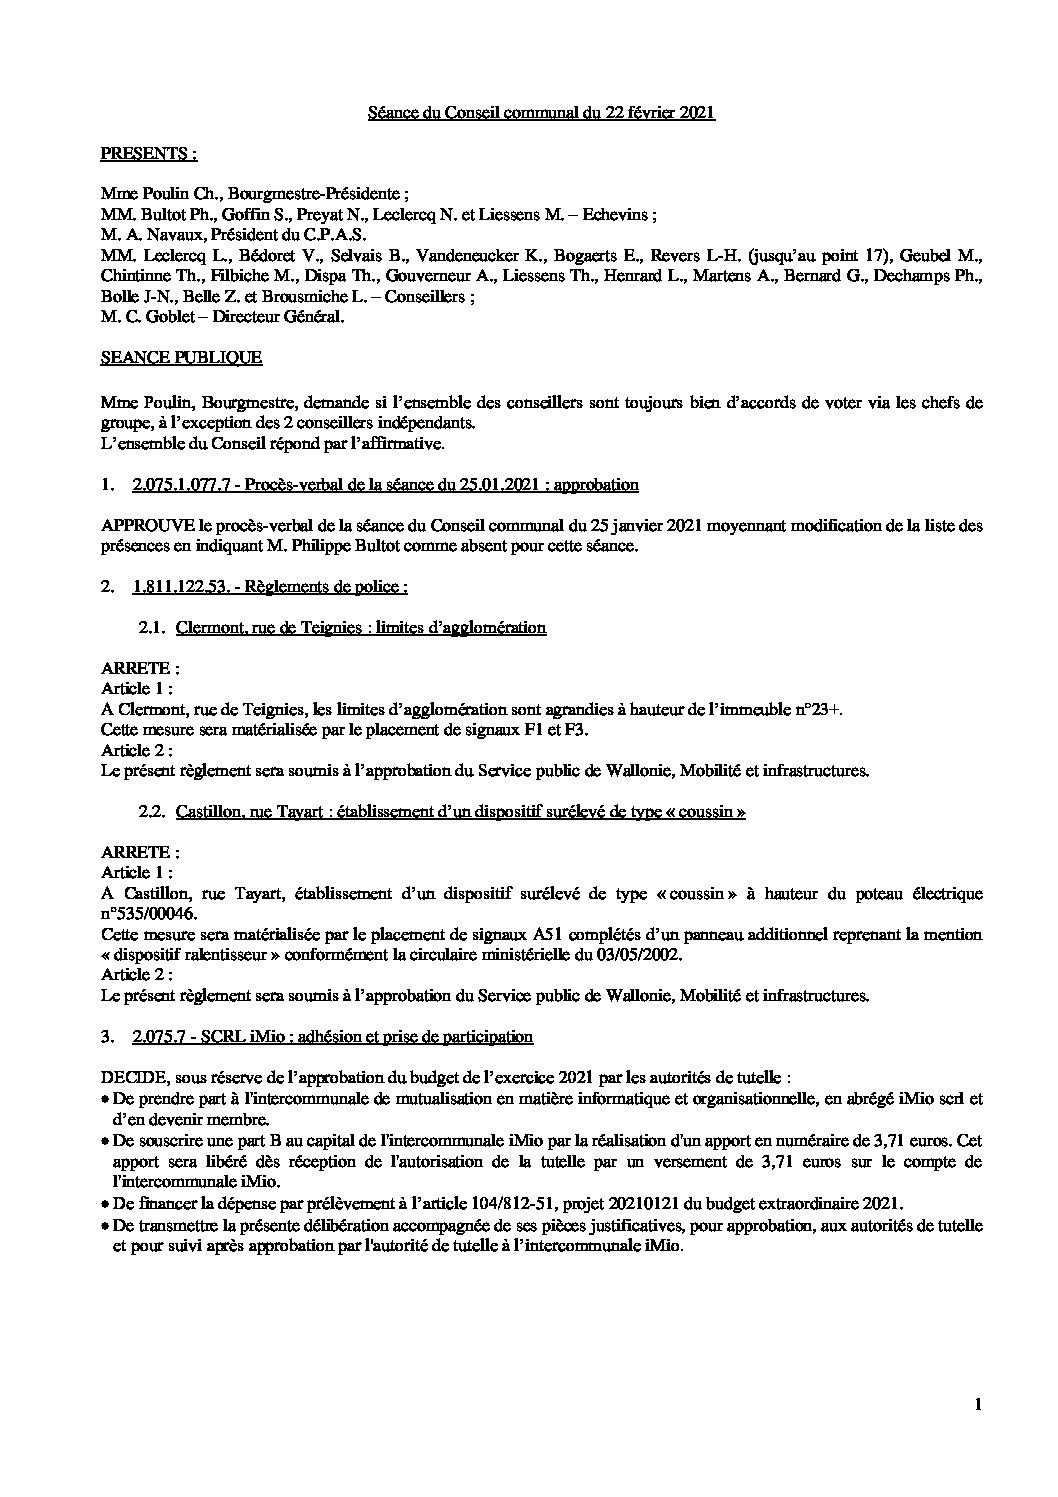 Conseil communal – 22 février 2021